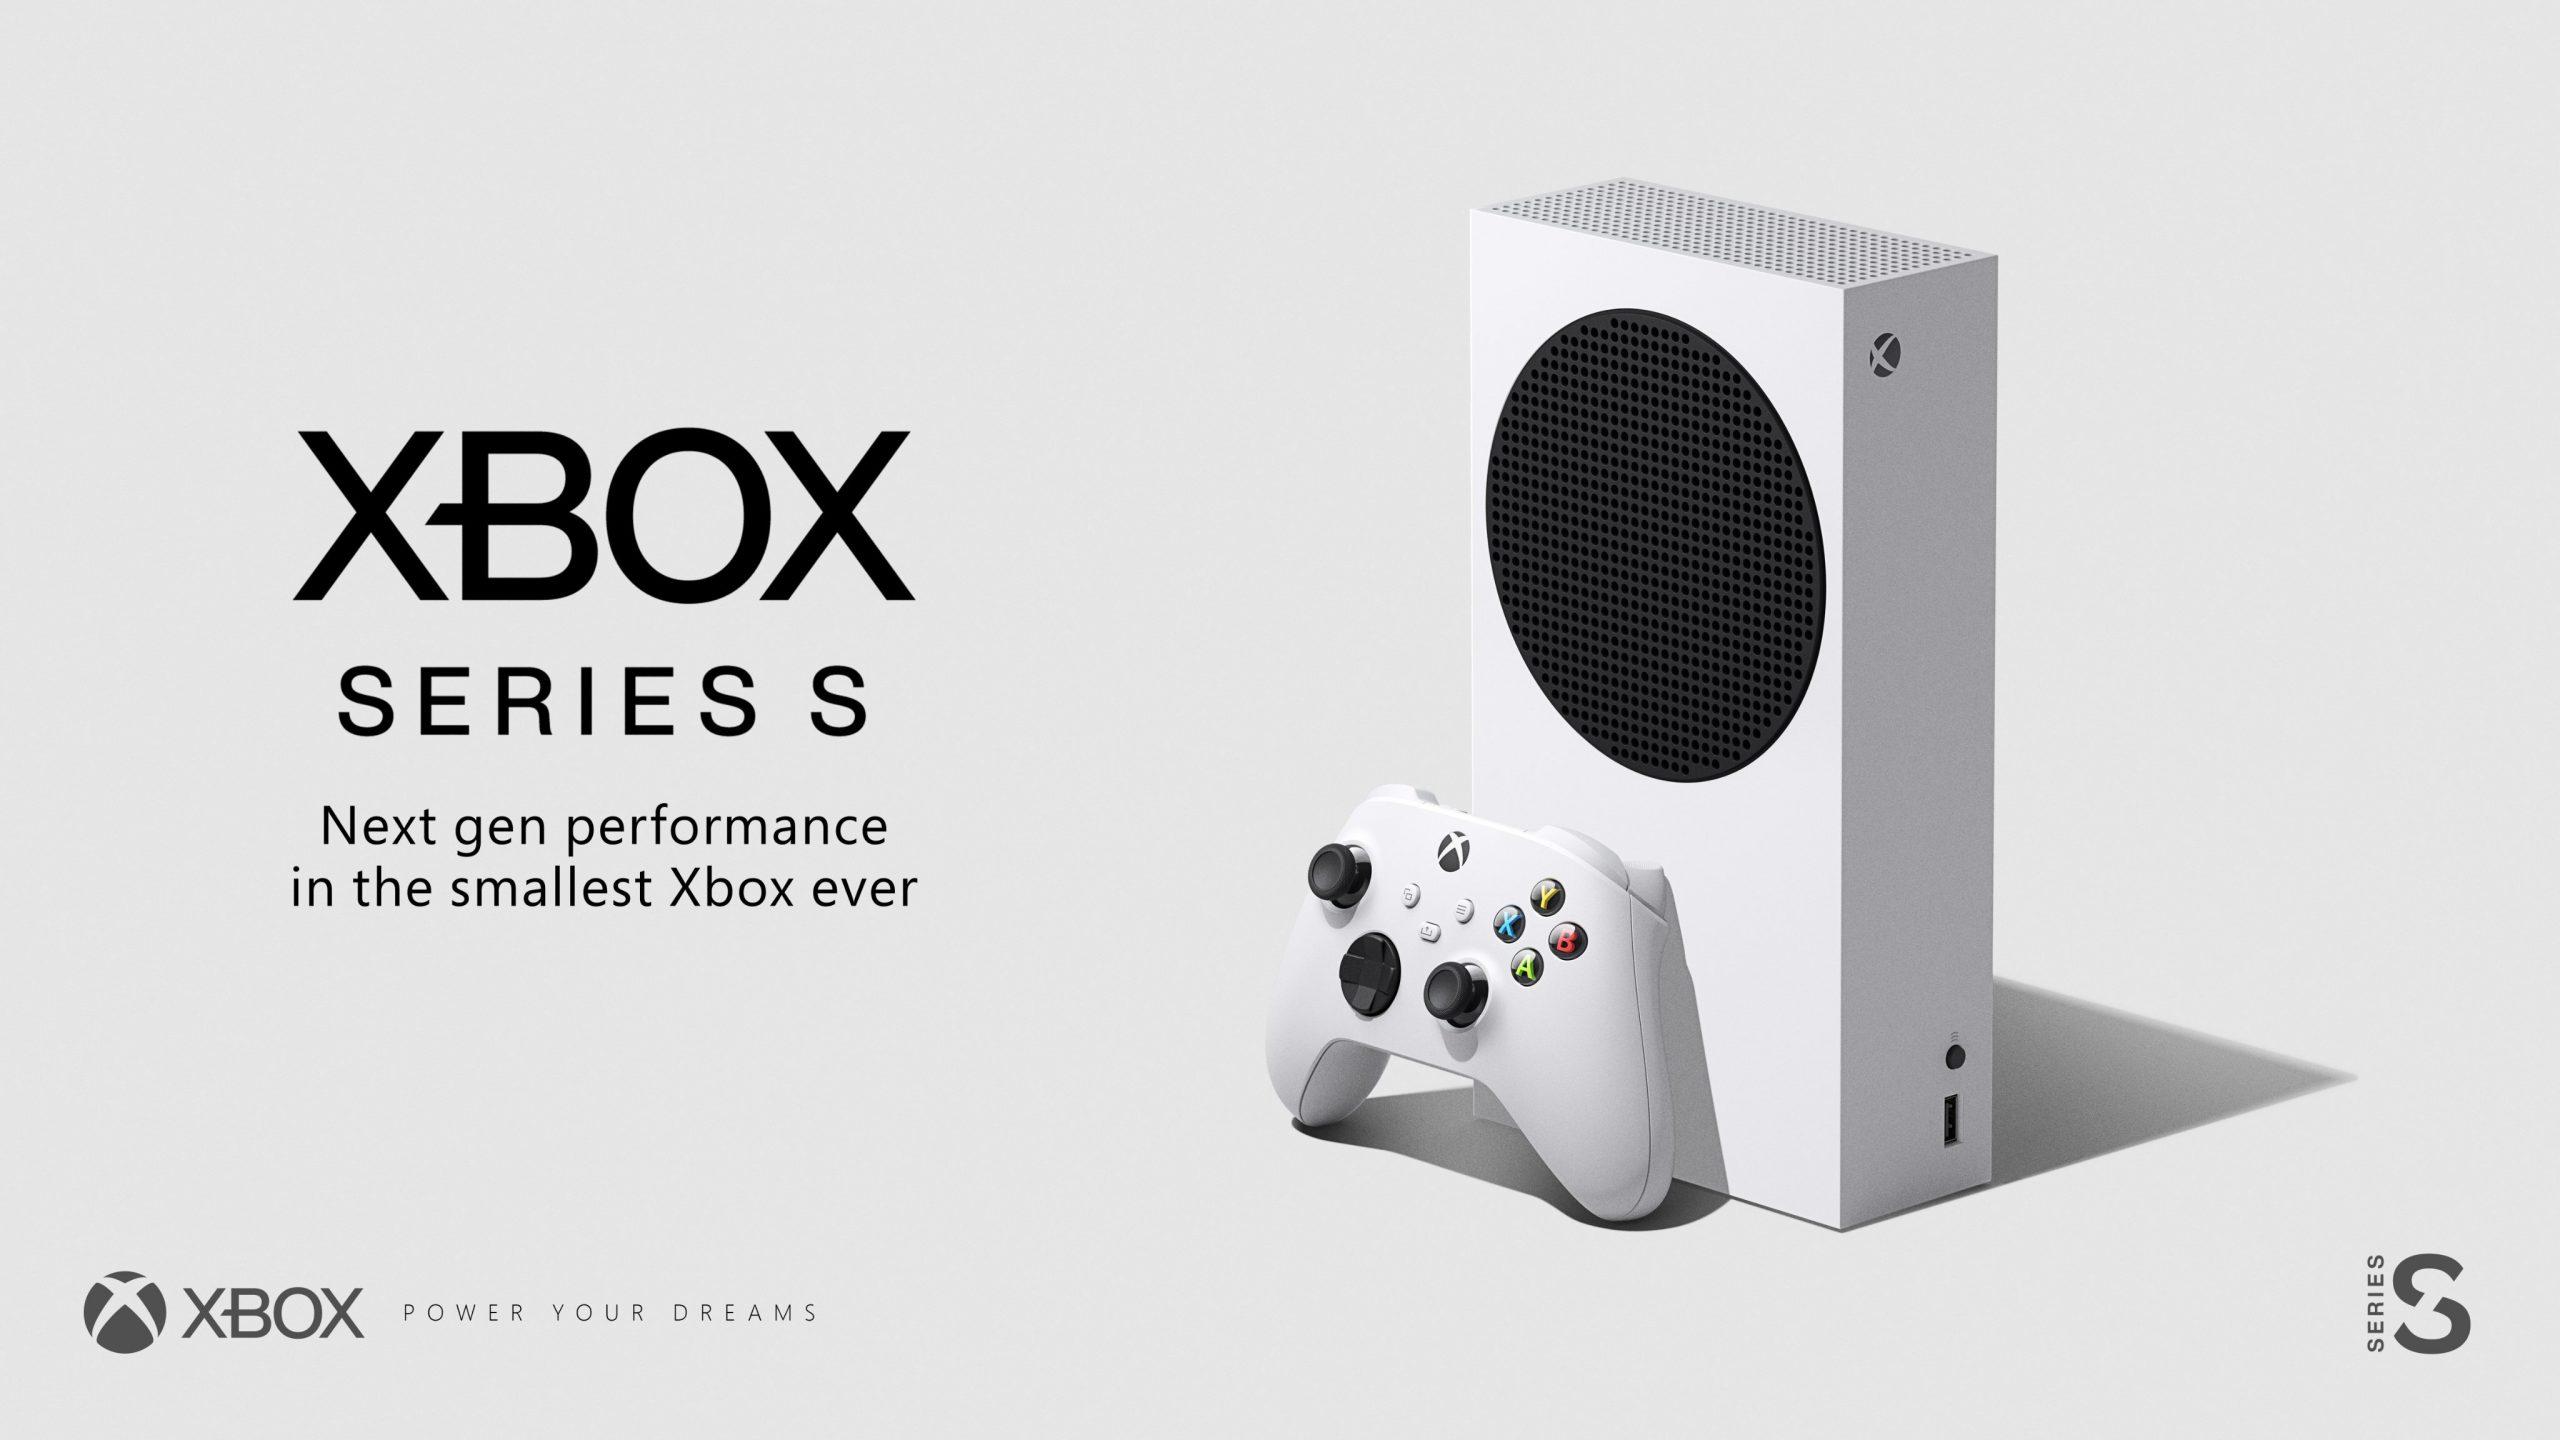 Microsoft confirms $299 Xbox Series S console